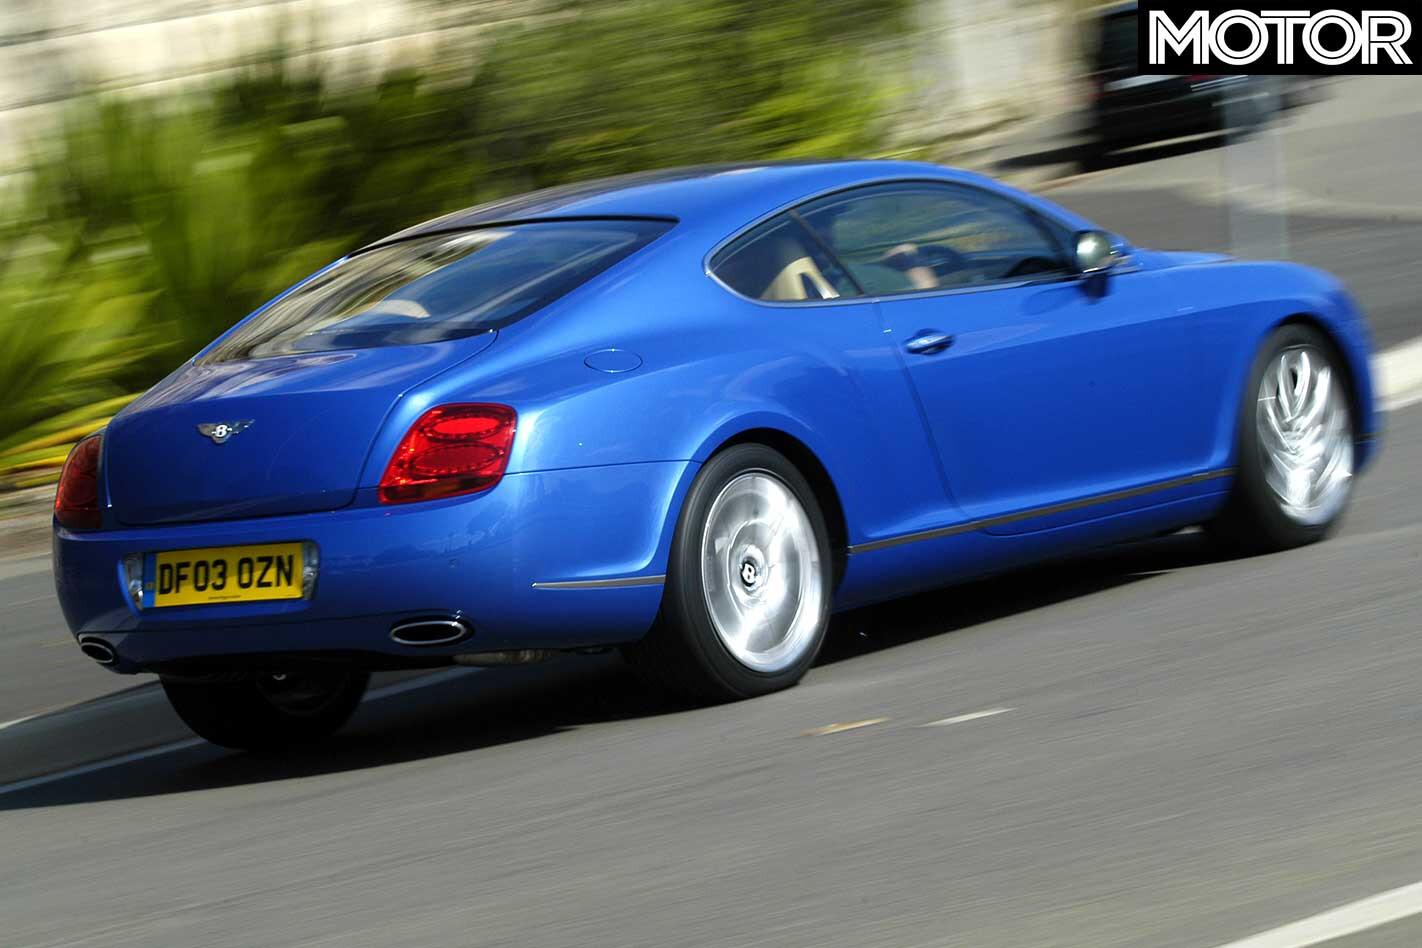 2004 Bentley Continental GT Performance Review Jpg